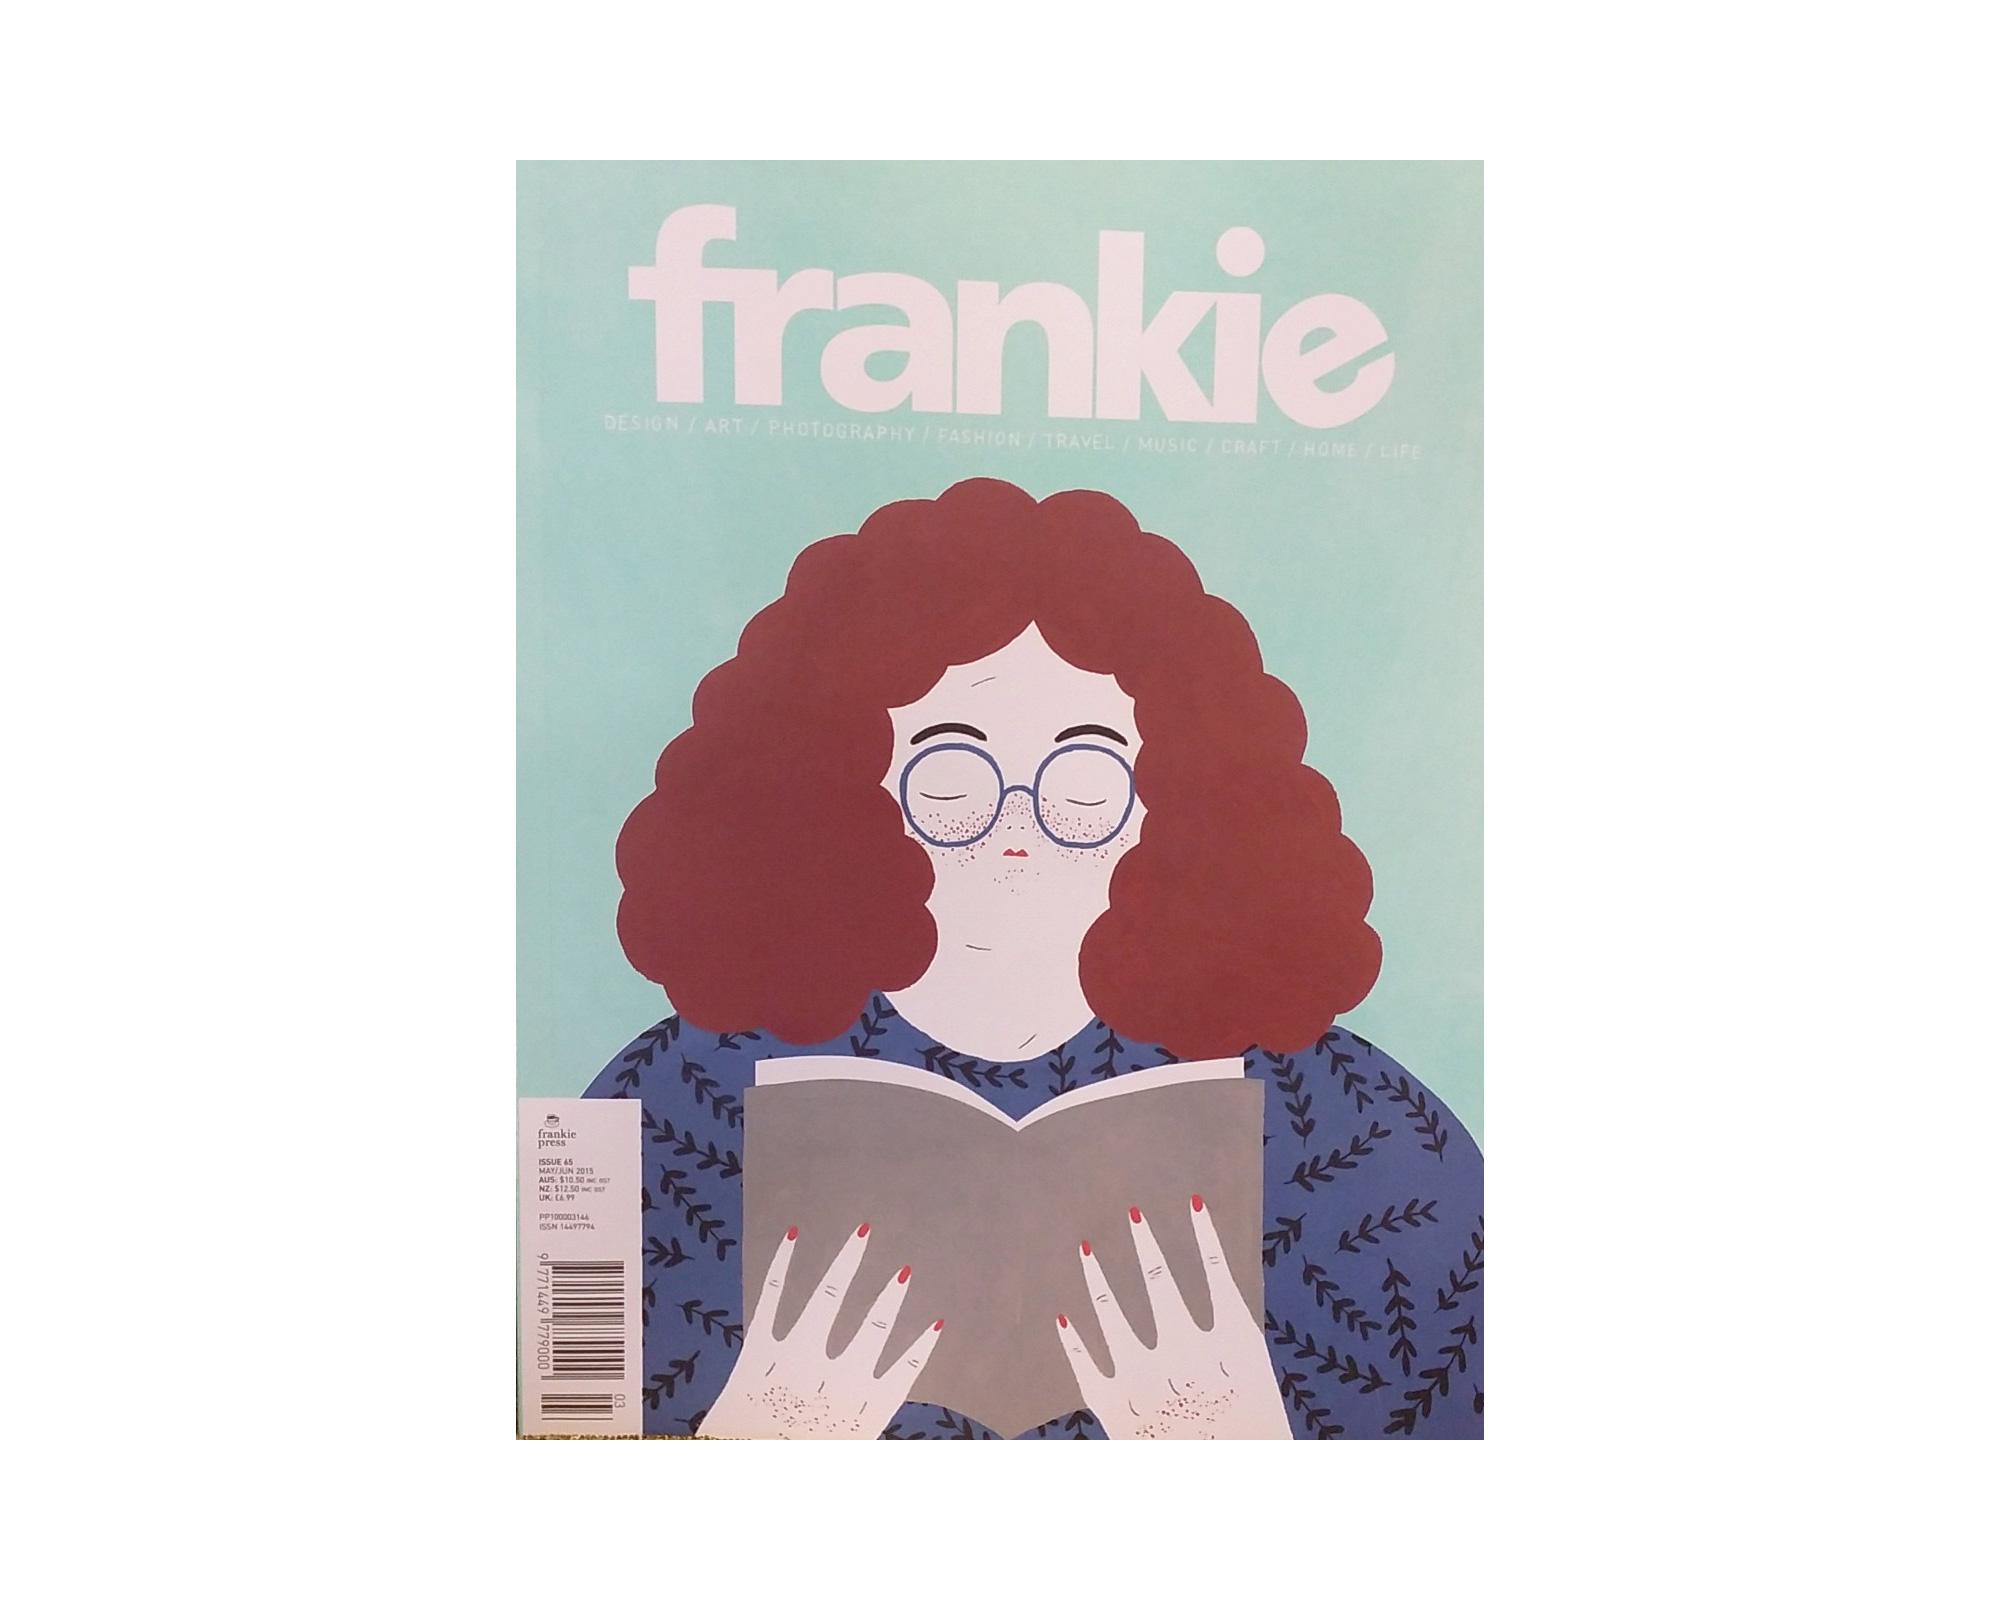 frankie-cover.jpg